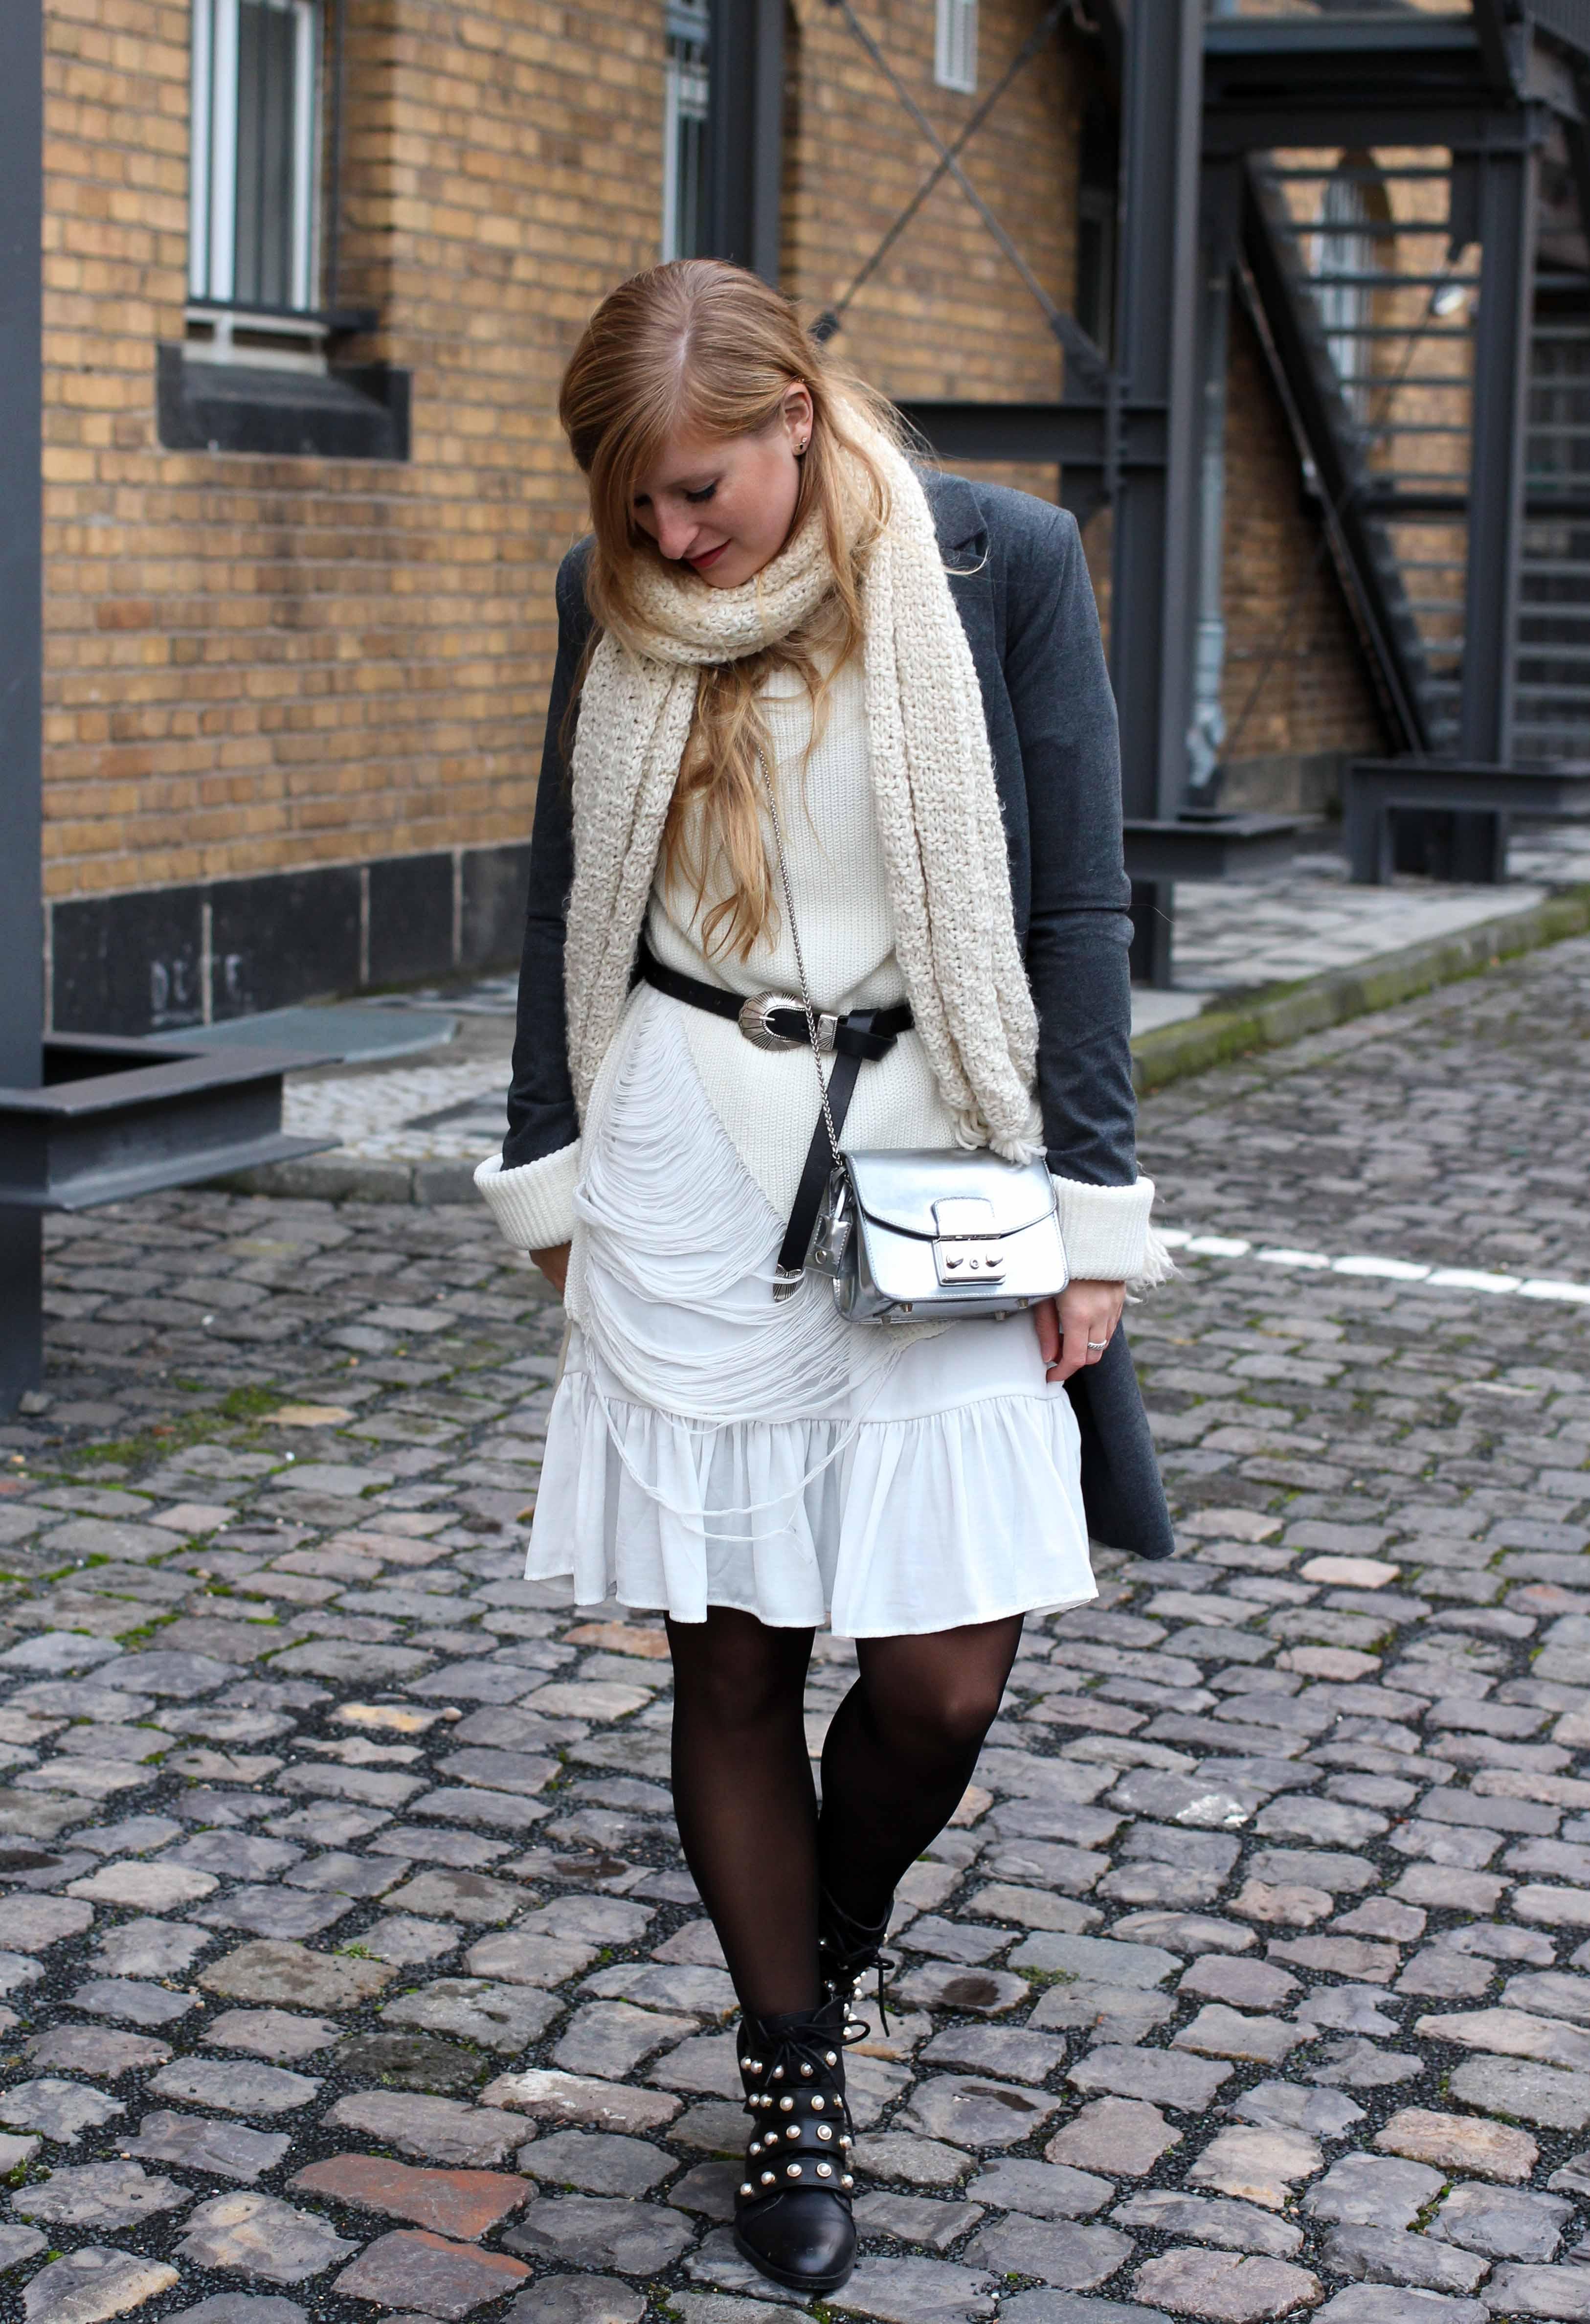 Winter-Layering weißes Kleid, Ripped Pullover Asos schwarze Strumpfhose Hunkemöller kombinieren Outfit Modeblog bonn 6